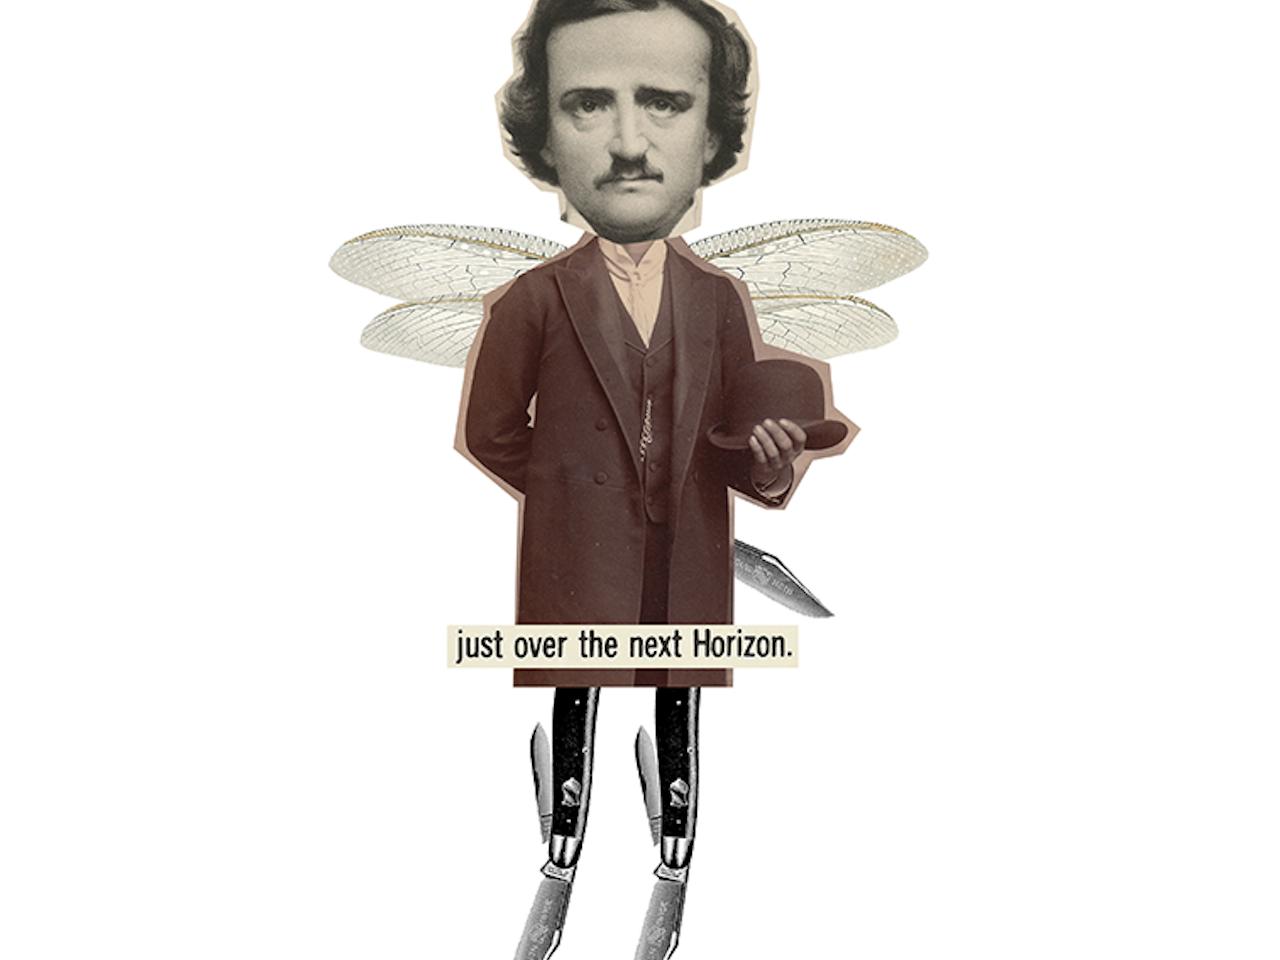 Edgar Dragonfly Poe